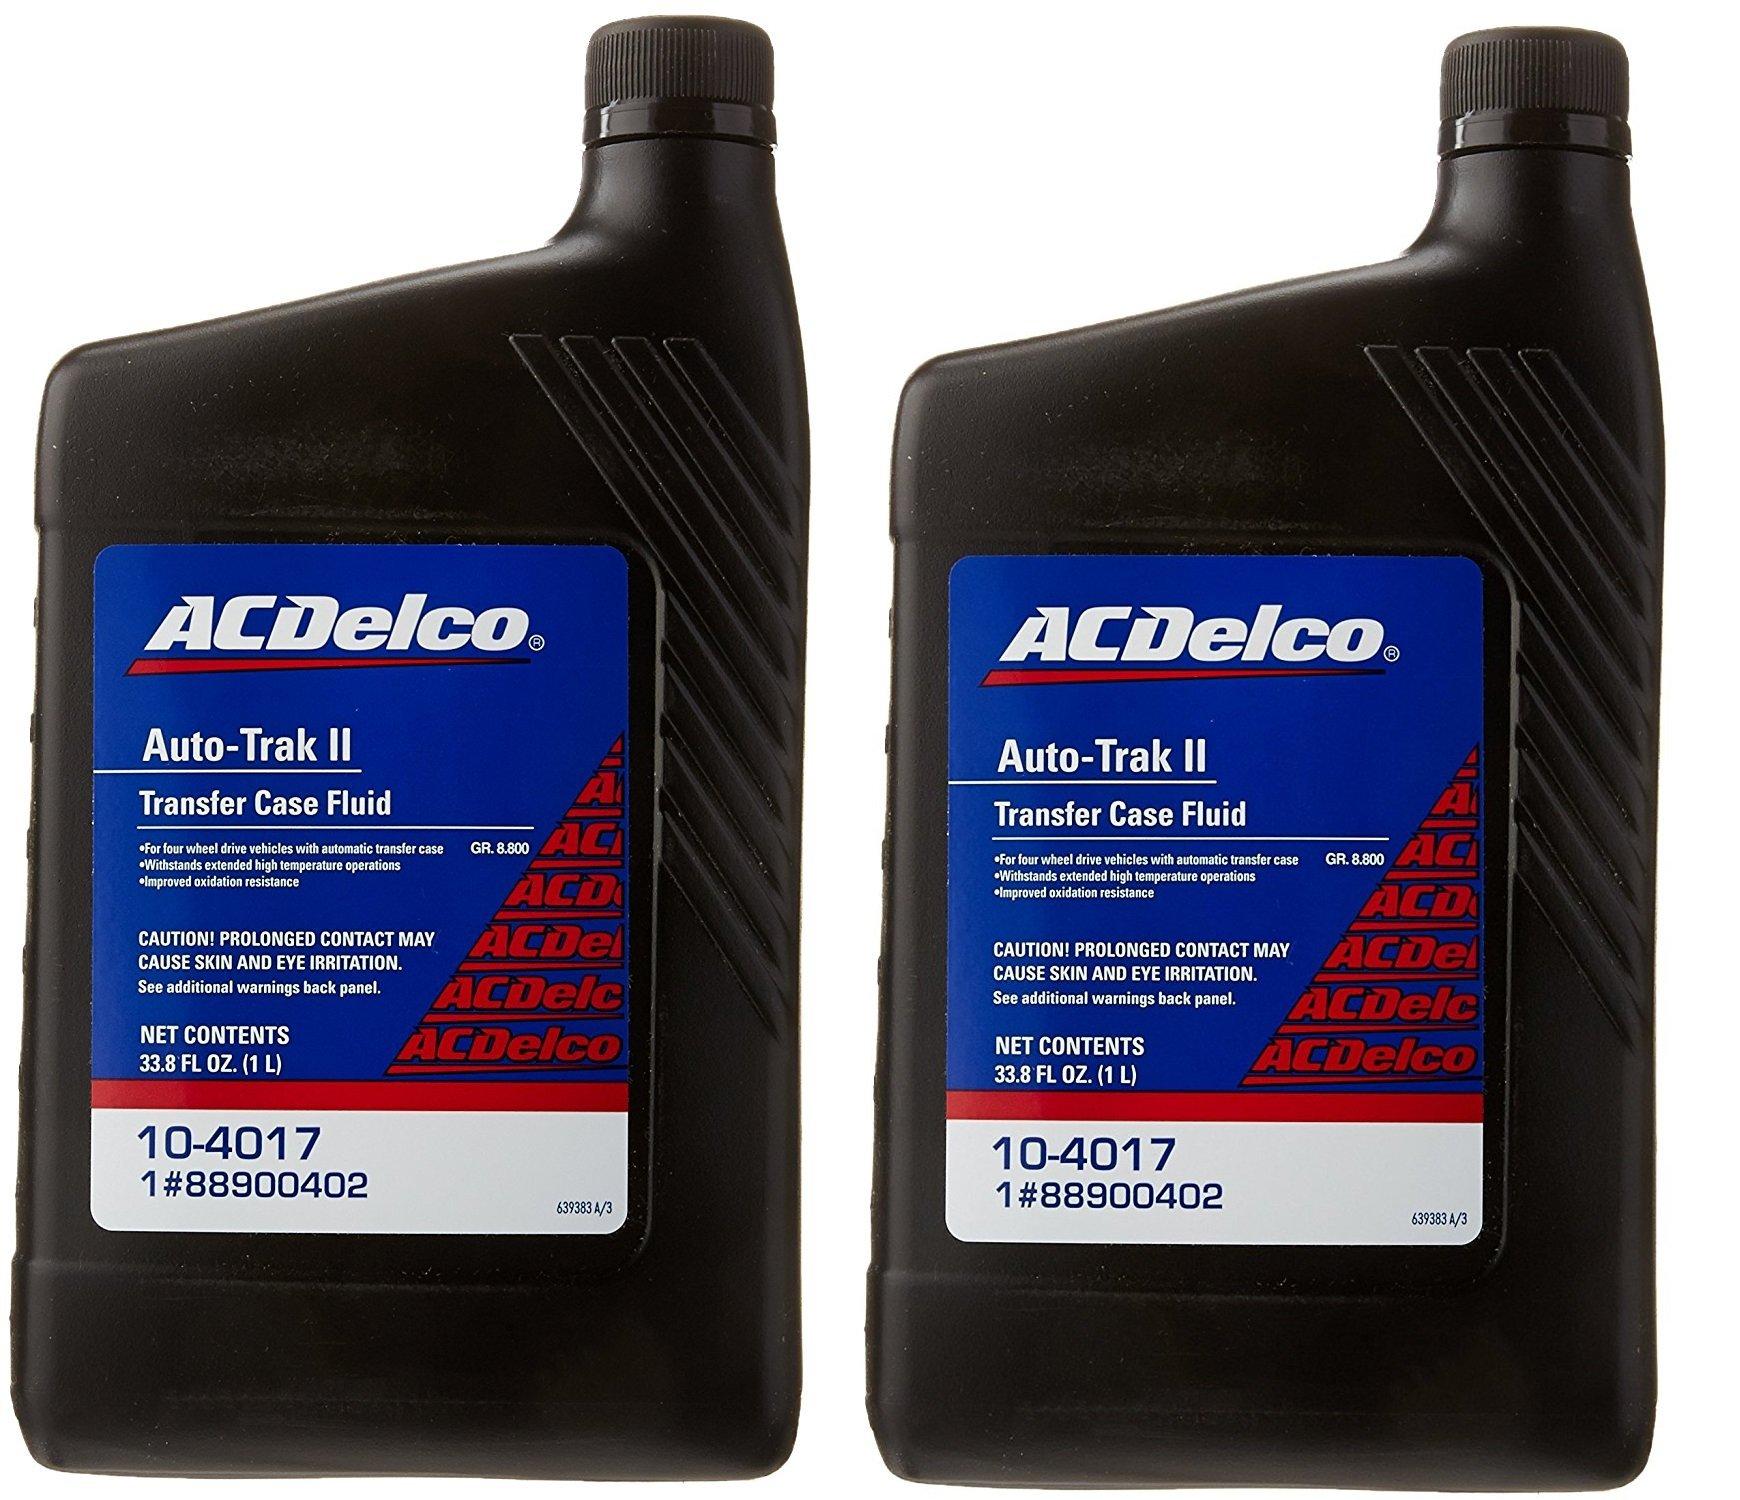 ACDelco 10-4017 Auto-Trak II Transfer Case Fluid - 33.8 oz